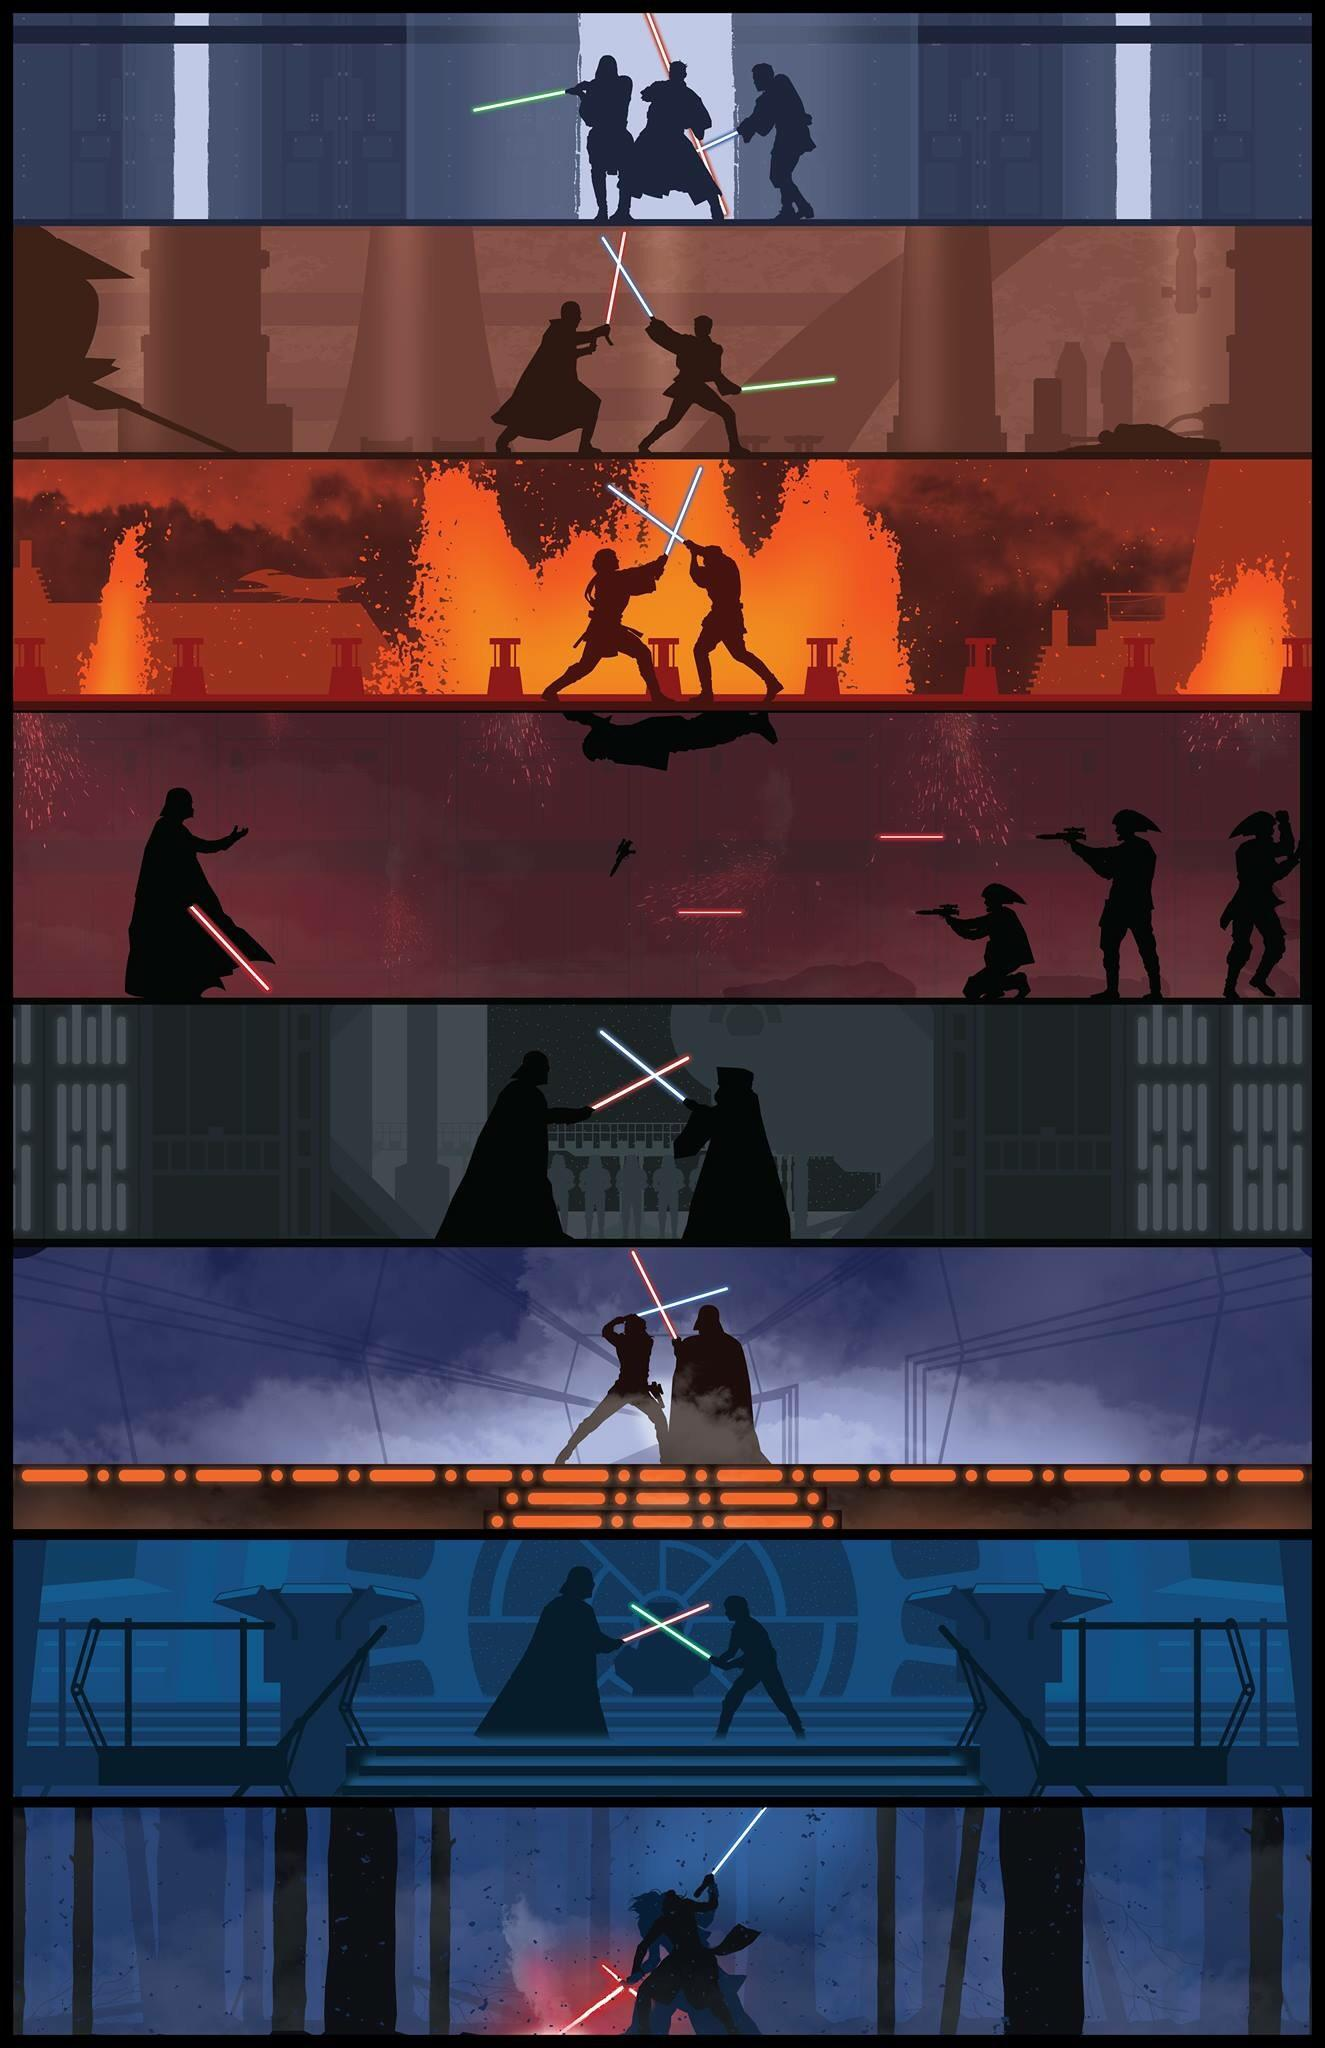 Starwars Wallpaper Posted By Sarah Johnson